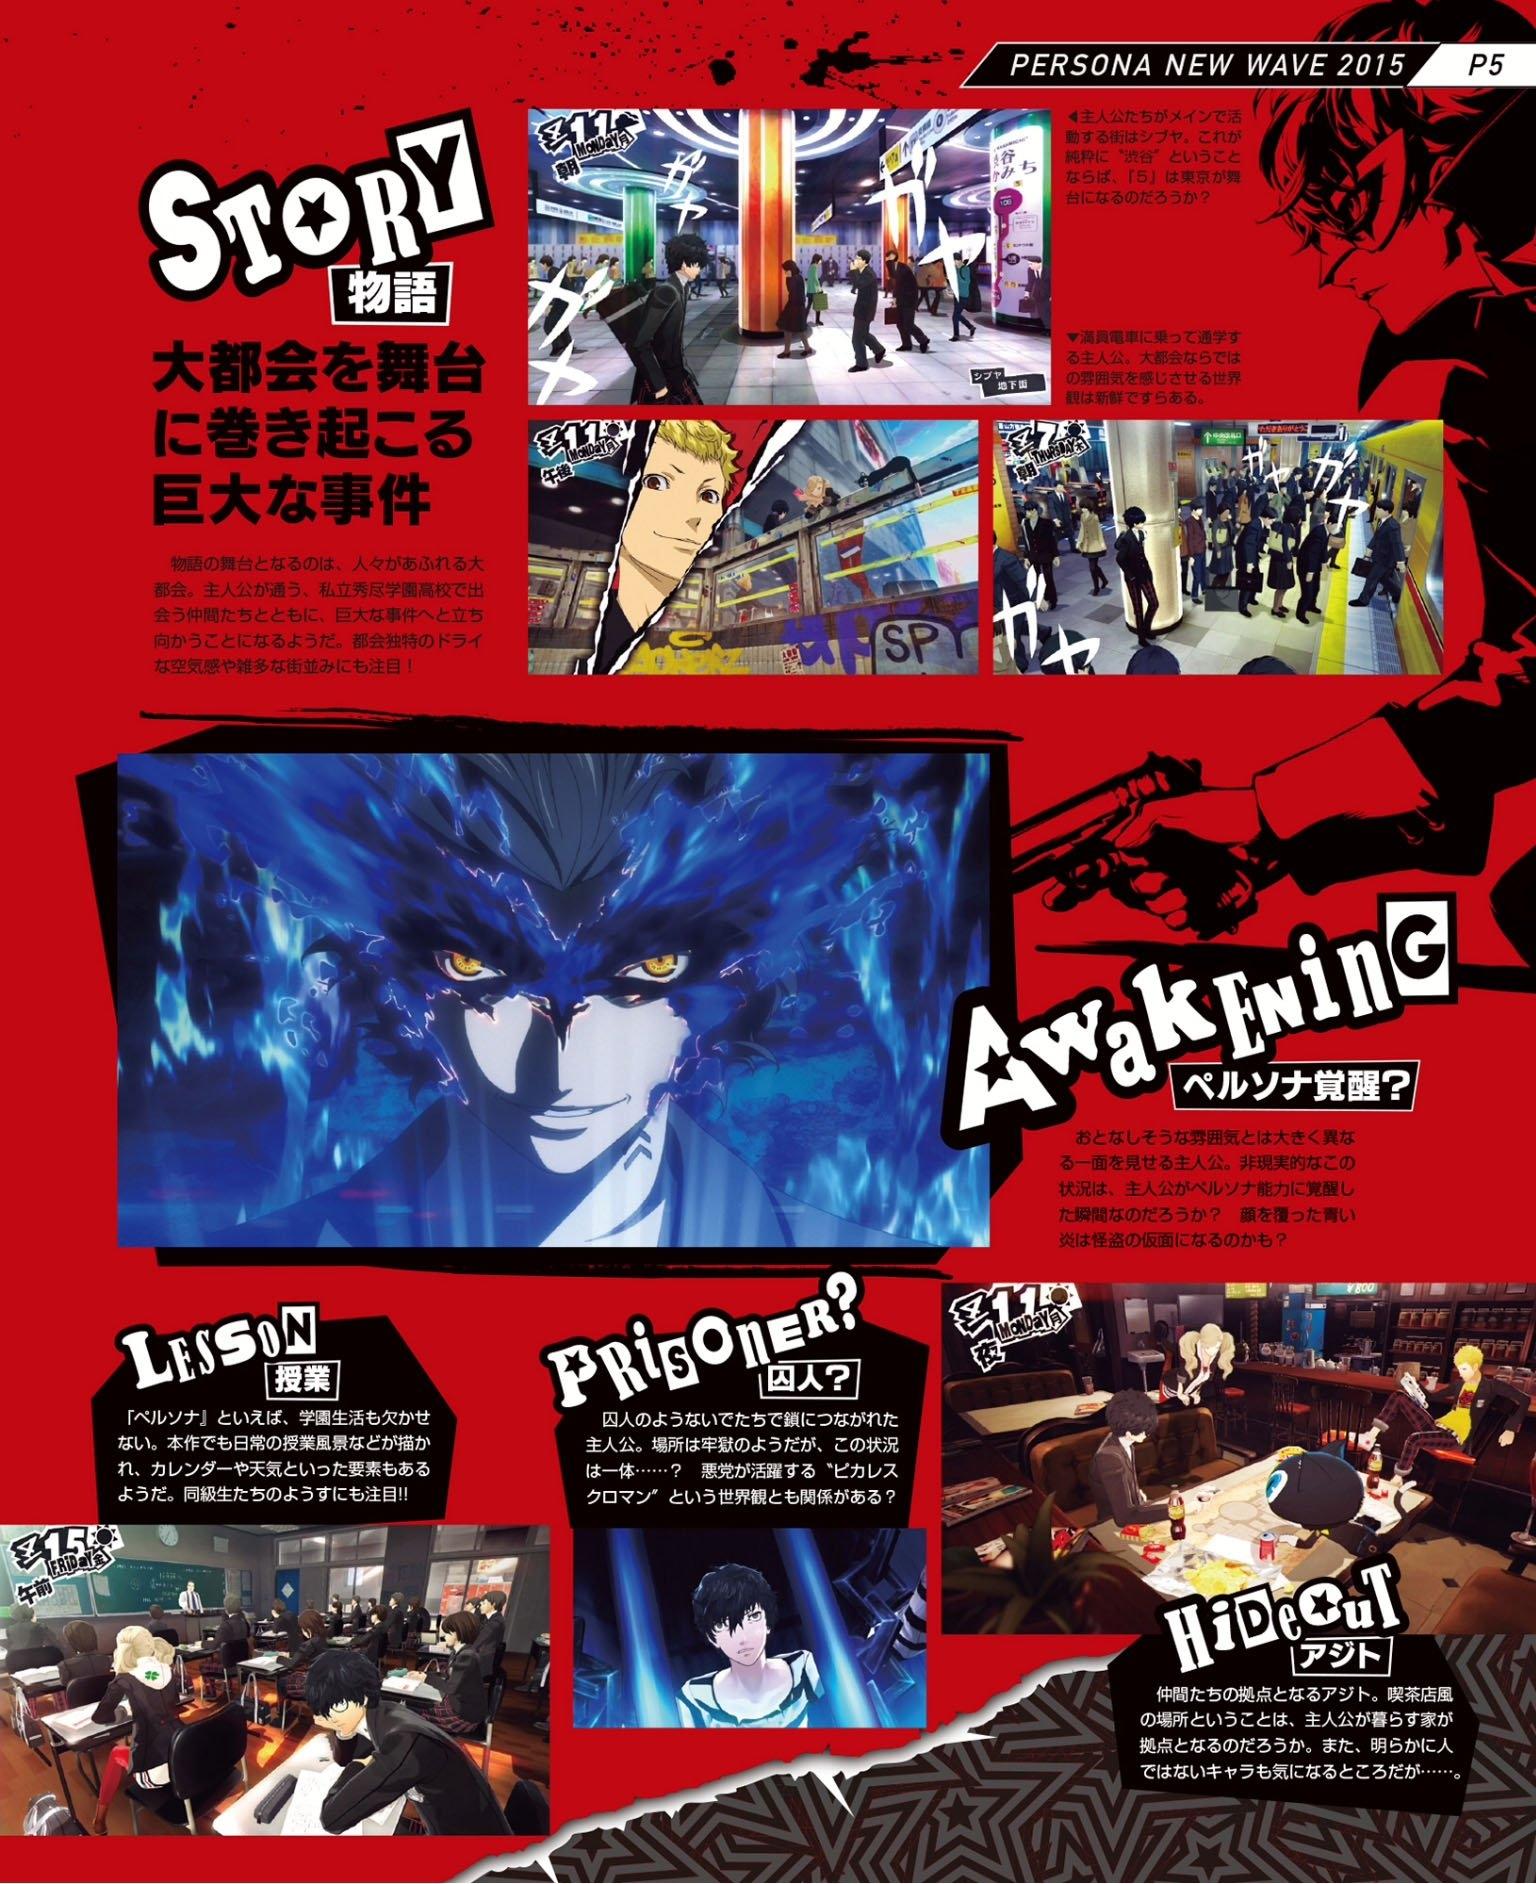 Dengeki Playstation Shares More Persona 5 Details, Full Scans - Gematsu Persona 5 Calendar 2019